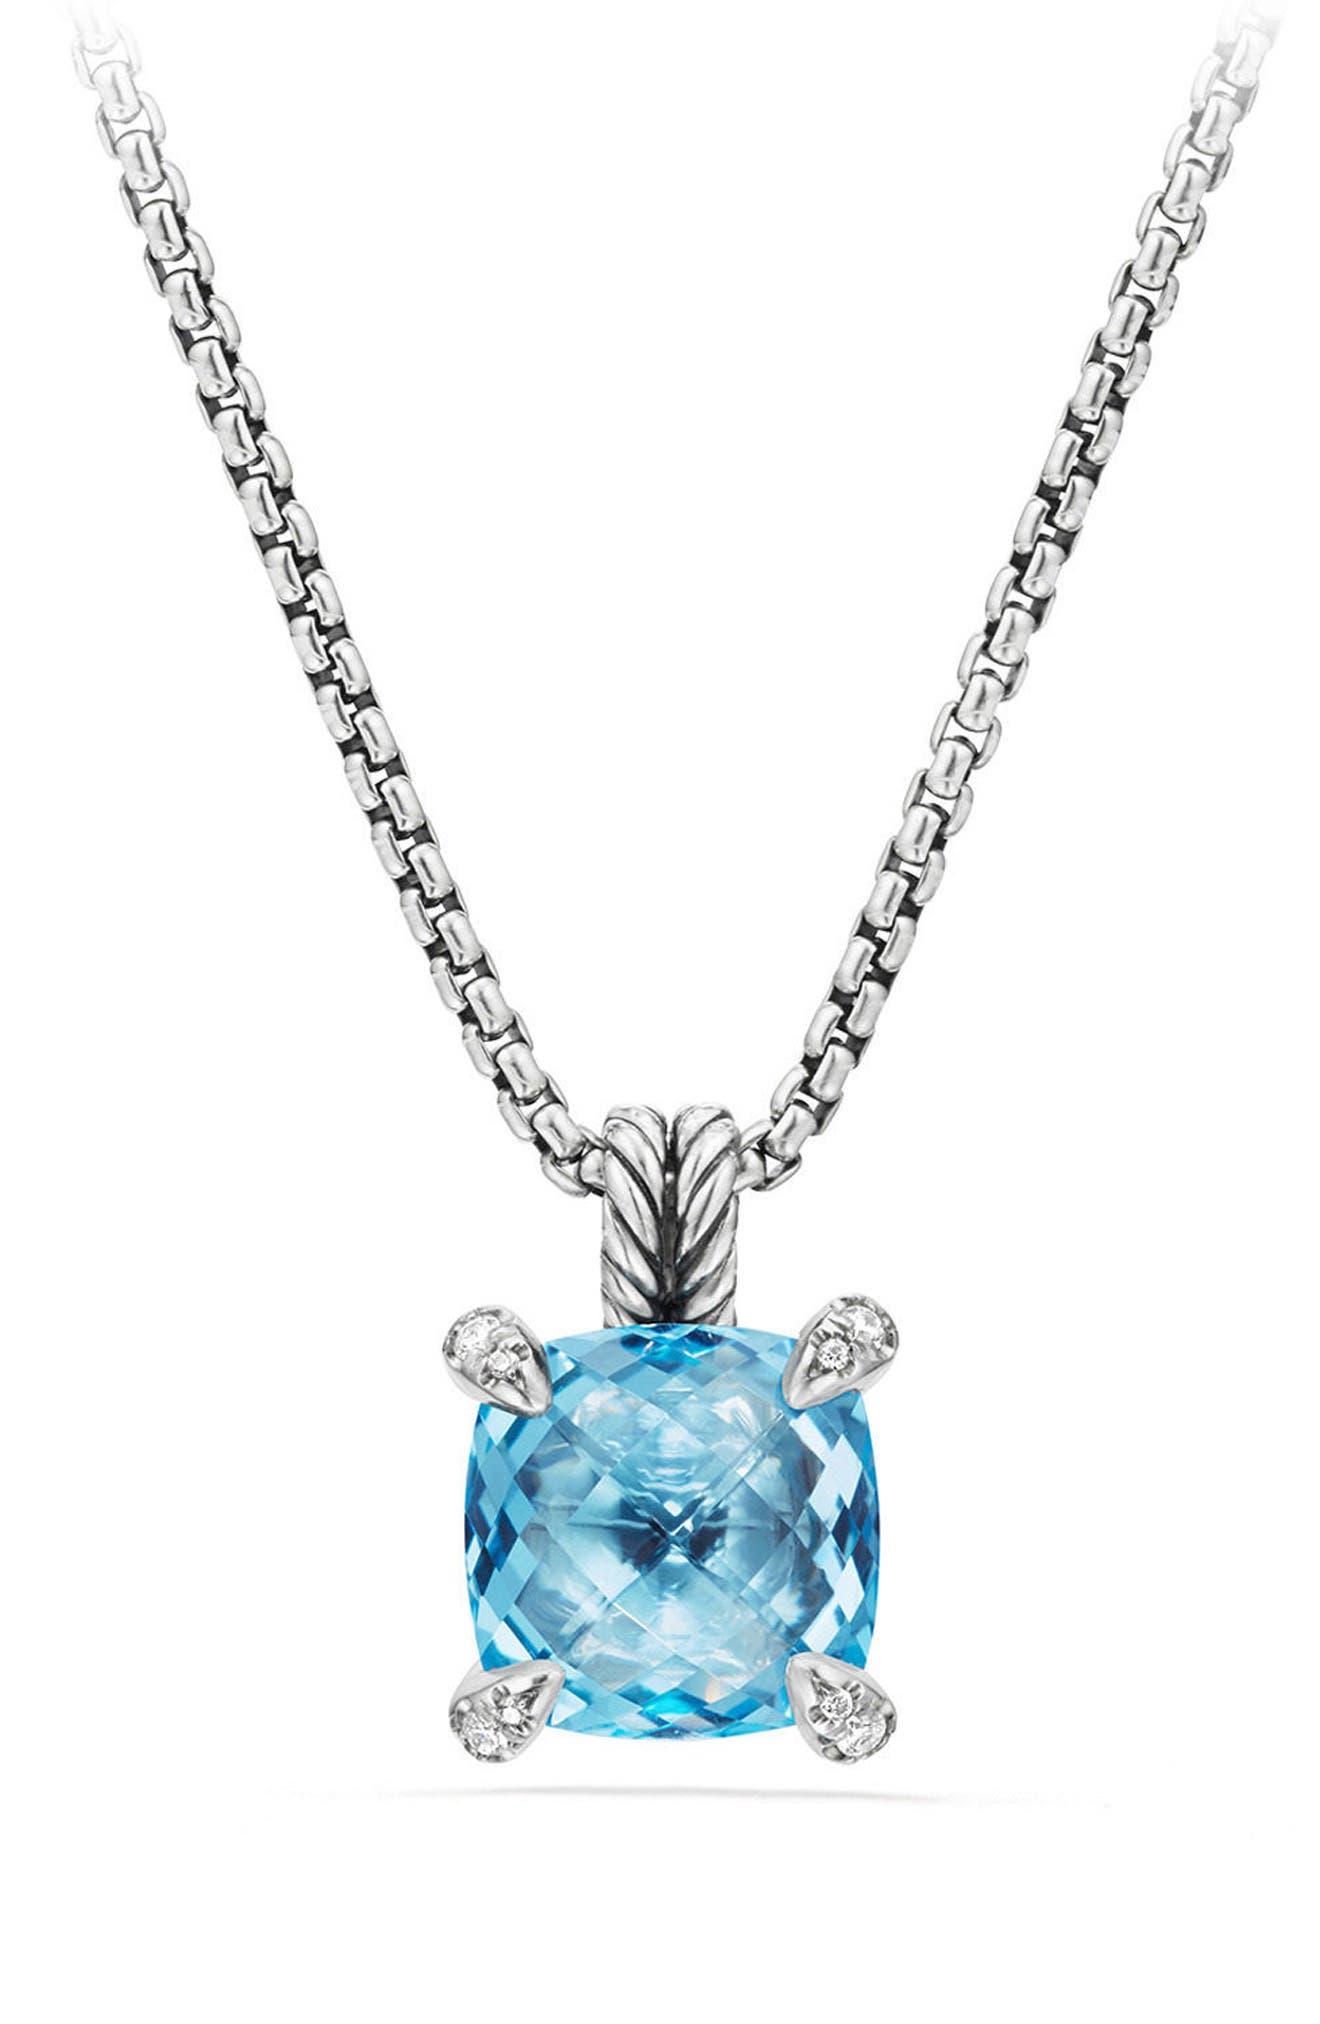 Châtelaine Pendant Necklace with Semiprecious Stone & Diamonds,                         Main,                         color, BLUE TOPAZ?